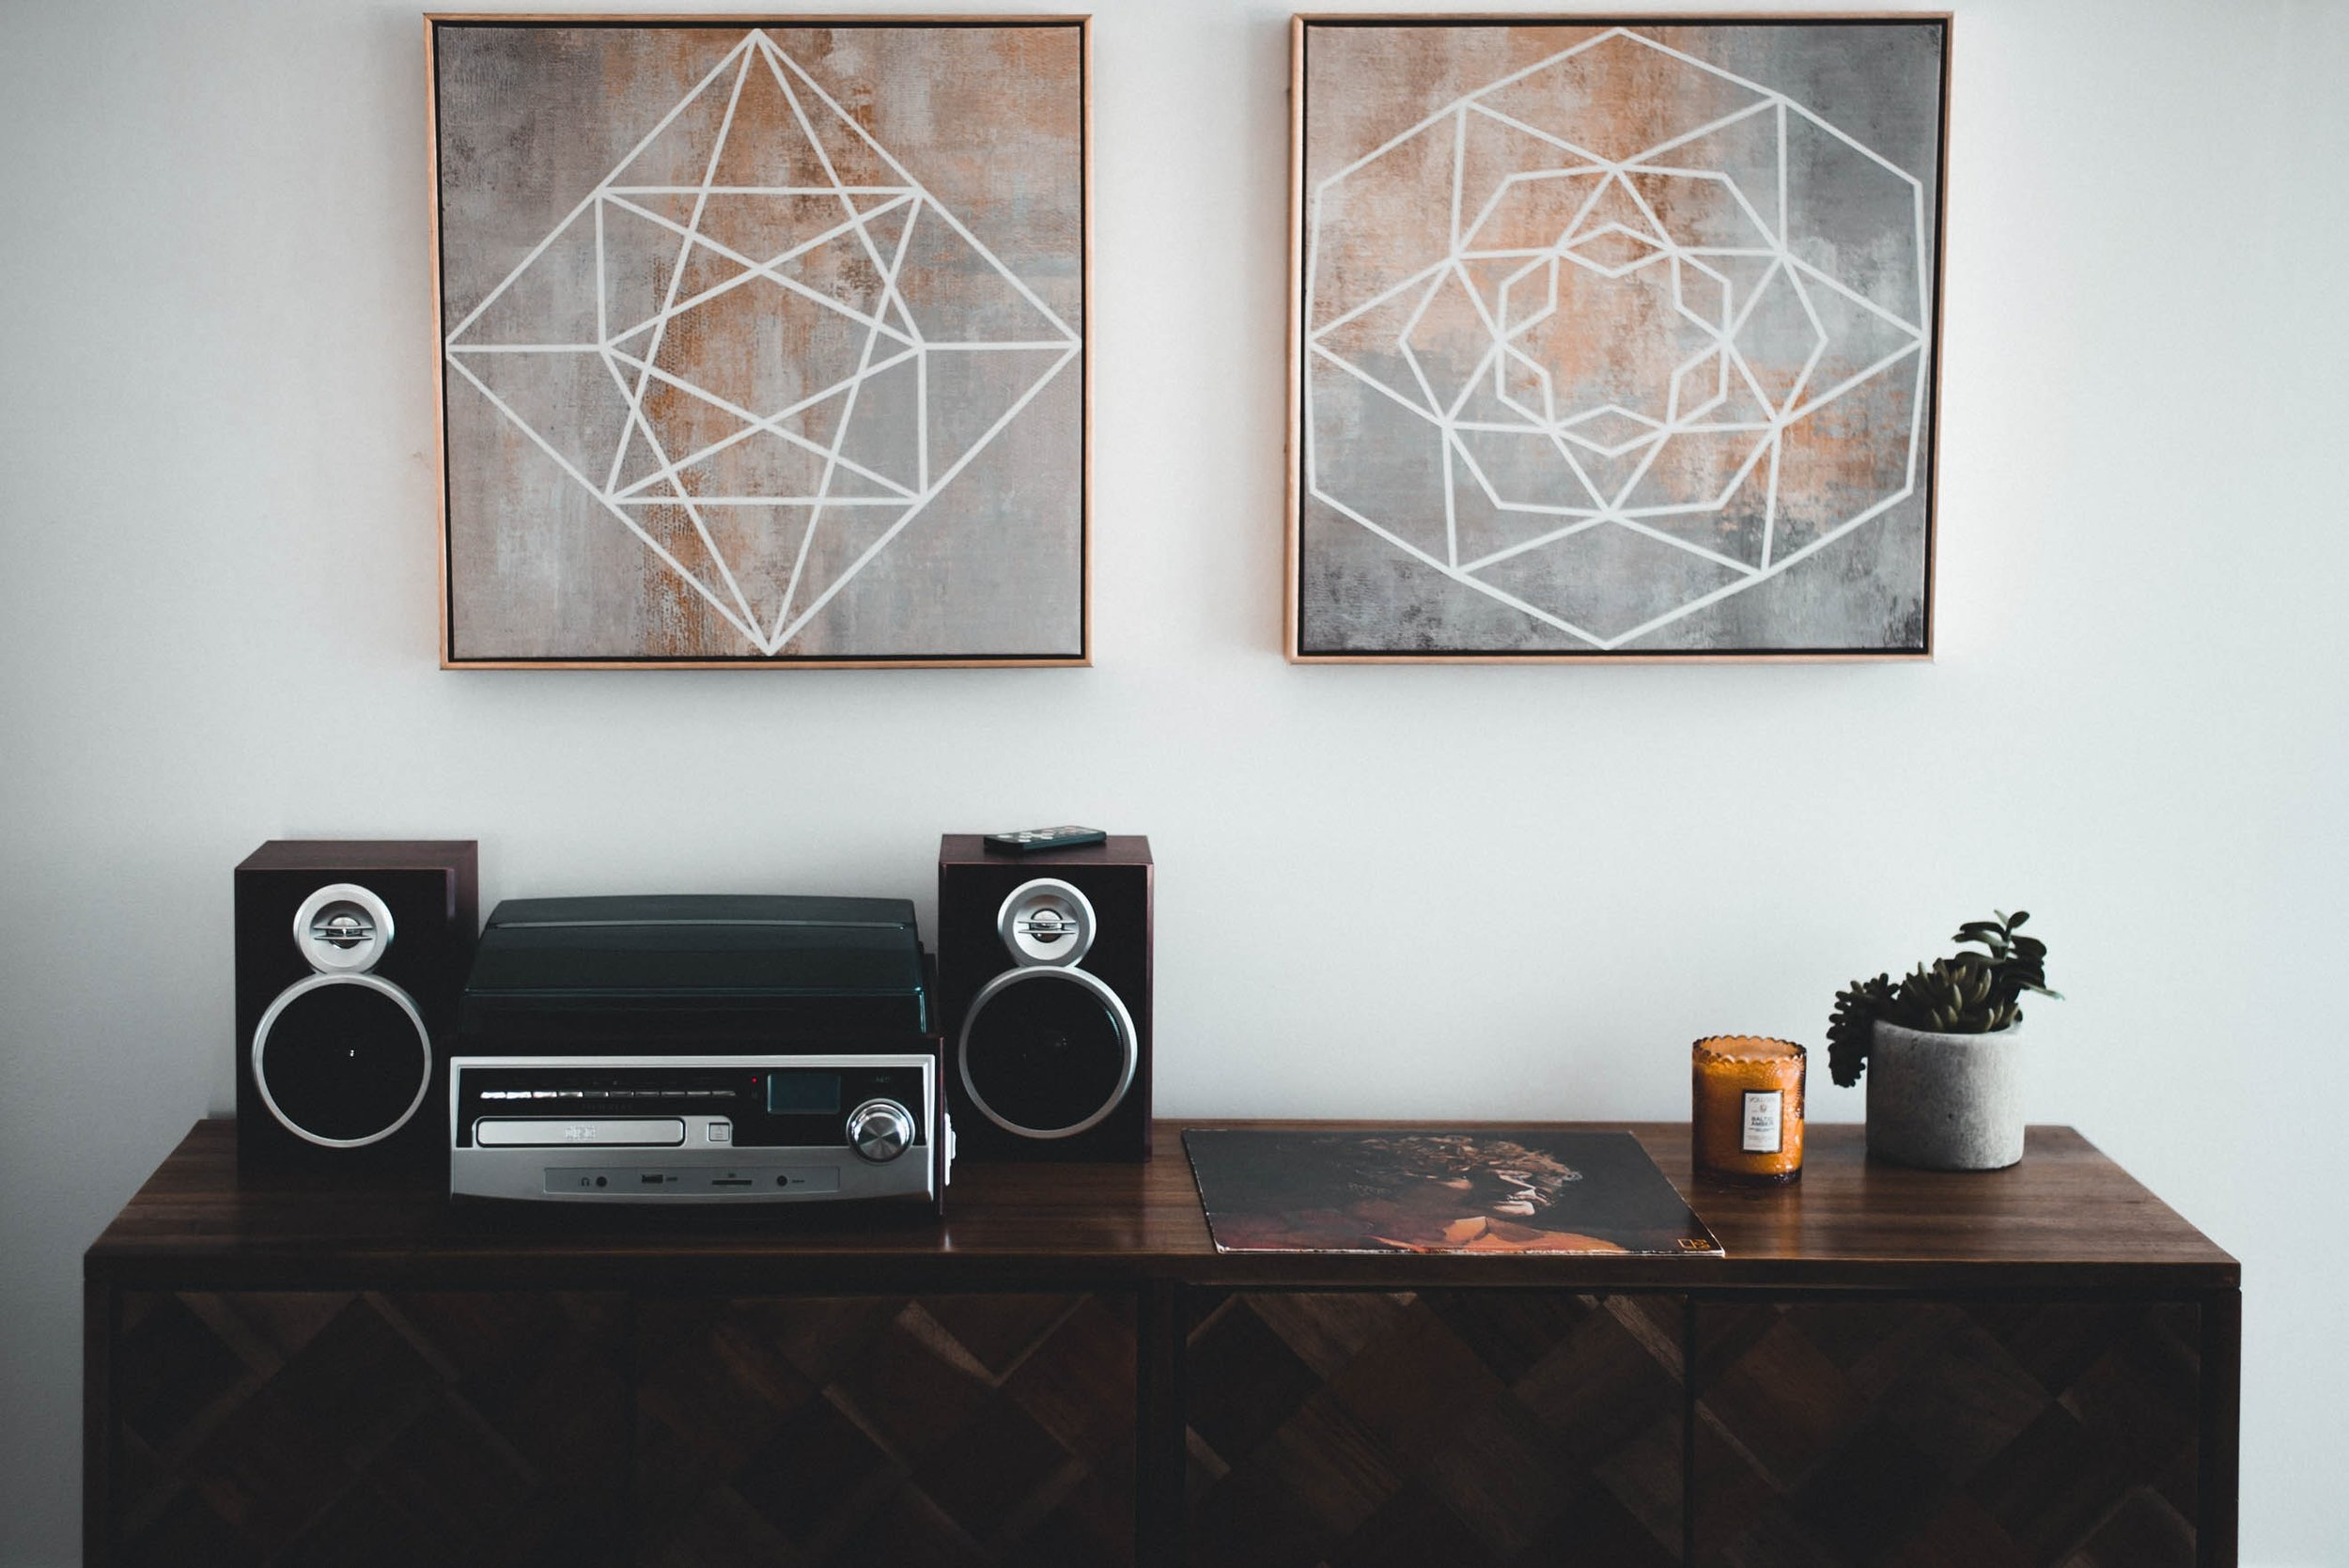 art-cabinet-decoration-706144.jpg